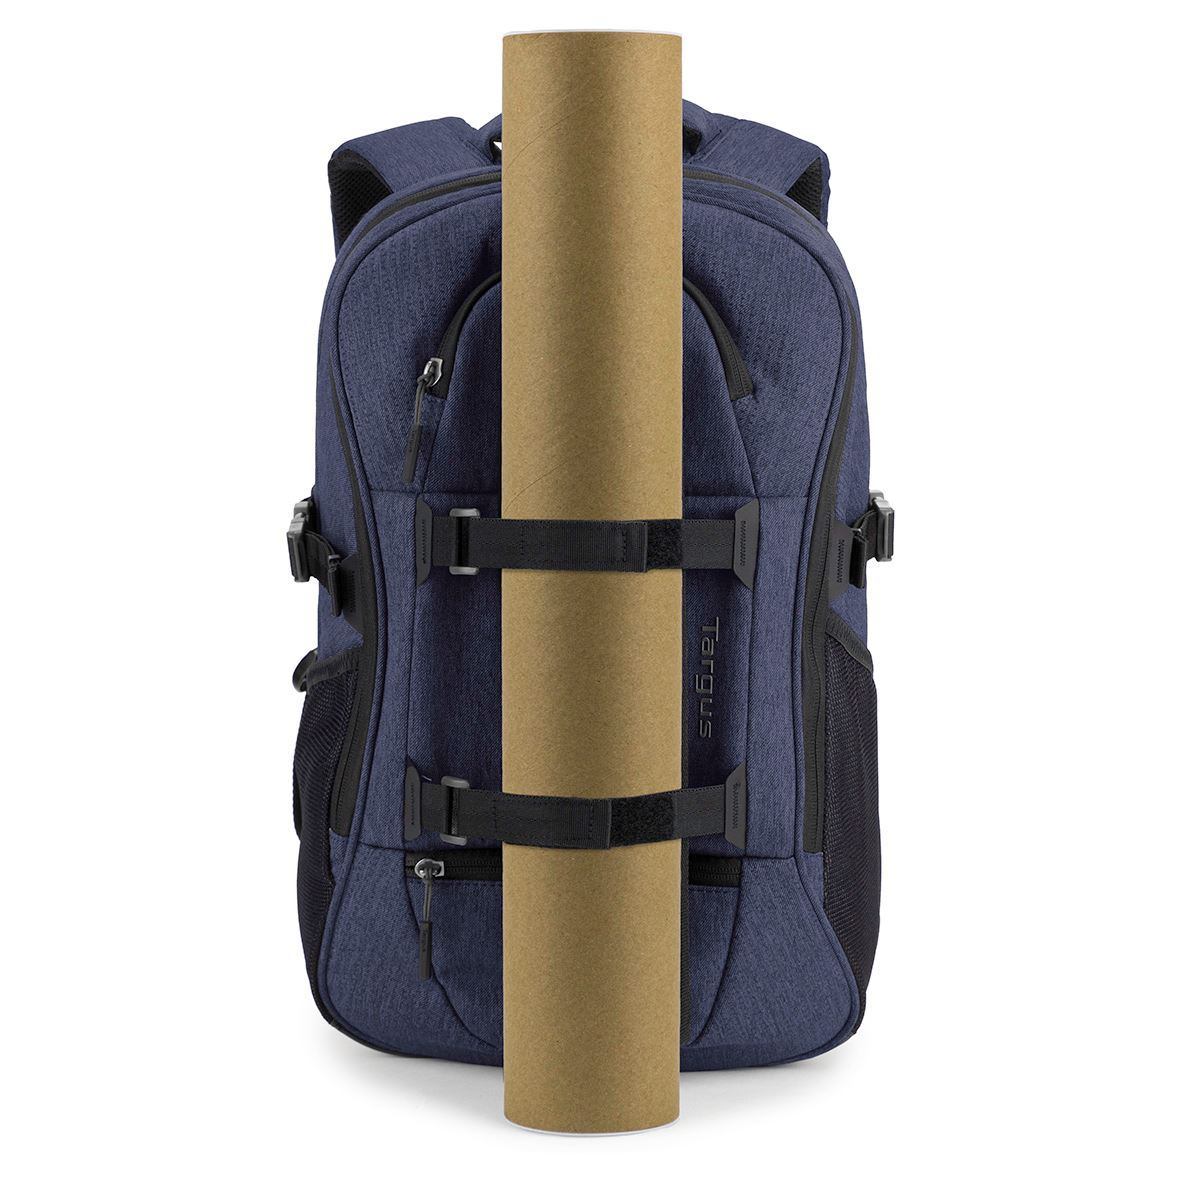 "Urban Explorer 15.6"" Laptop Backpack"